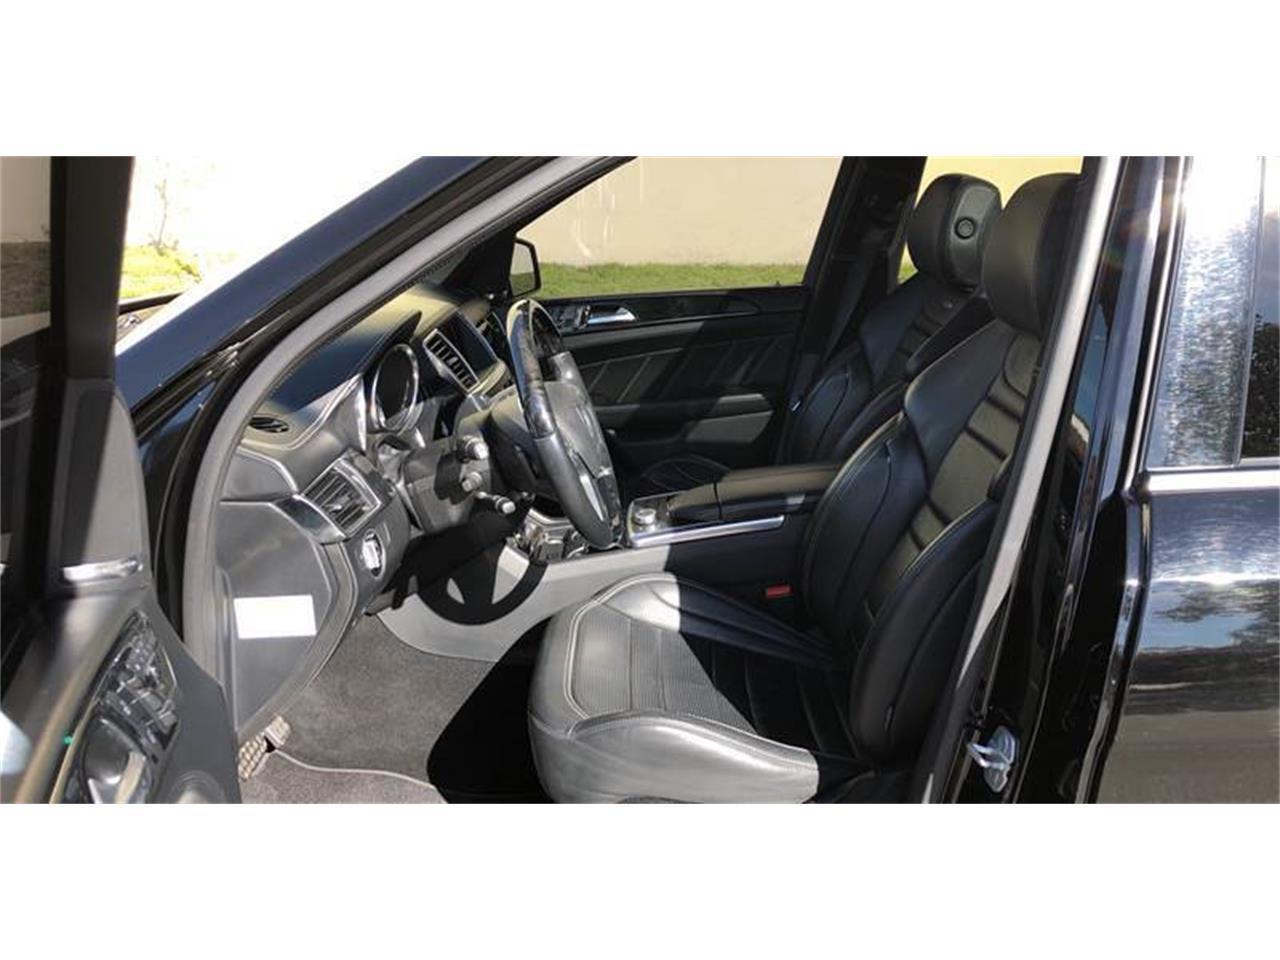 2012 Mercedes-Benz M-Class (CC-1310661) for sale in Brea, California